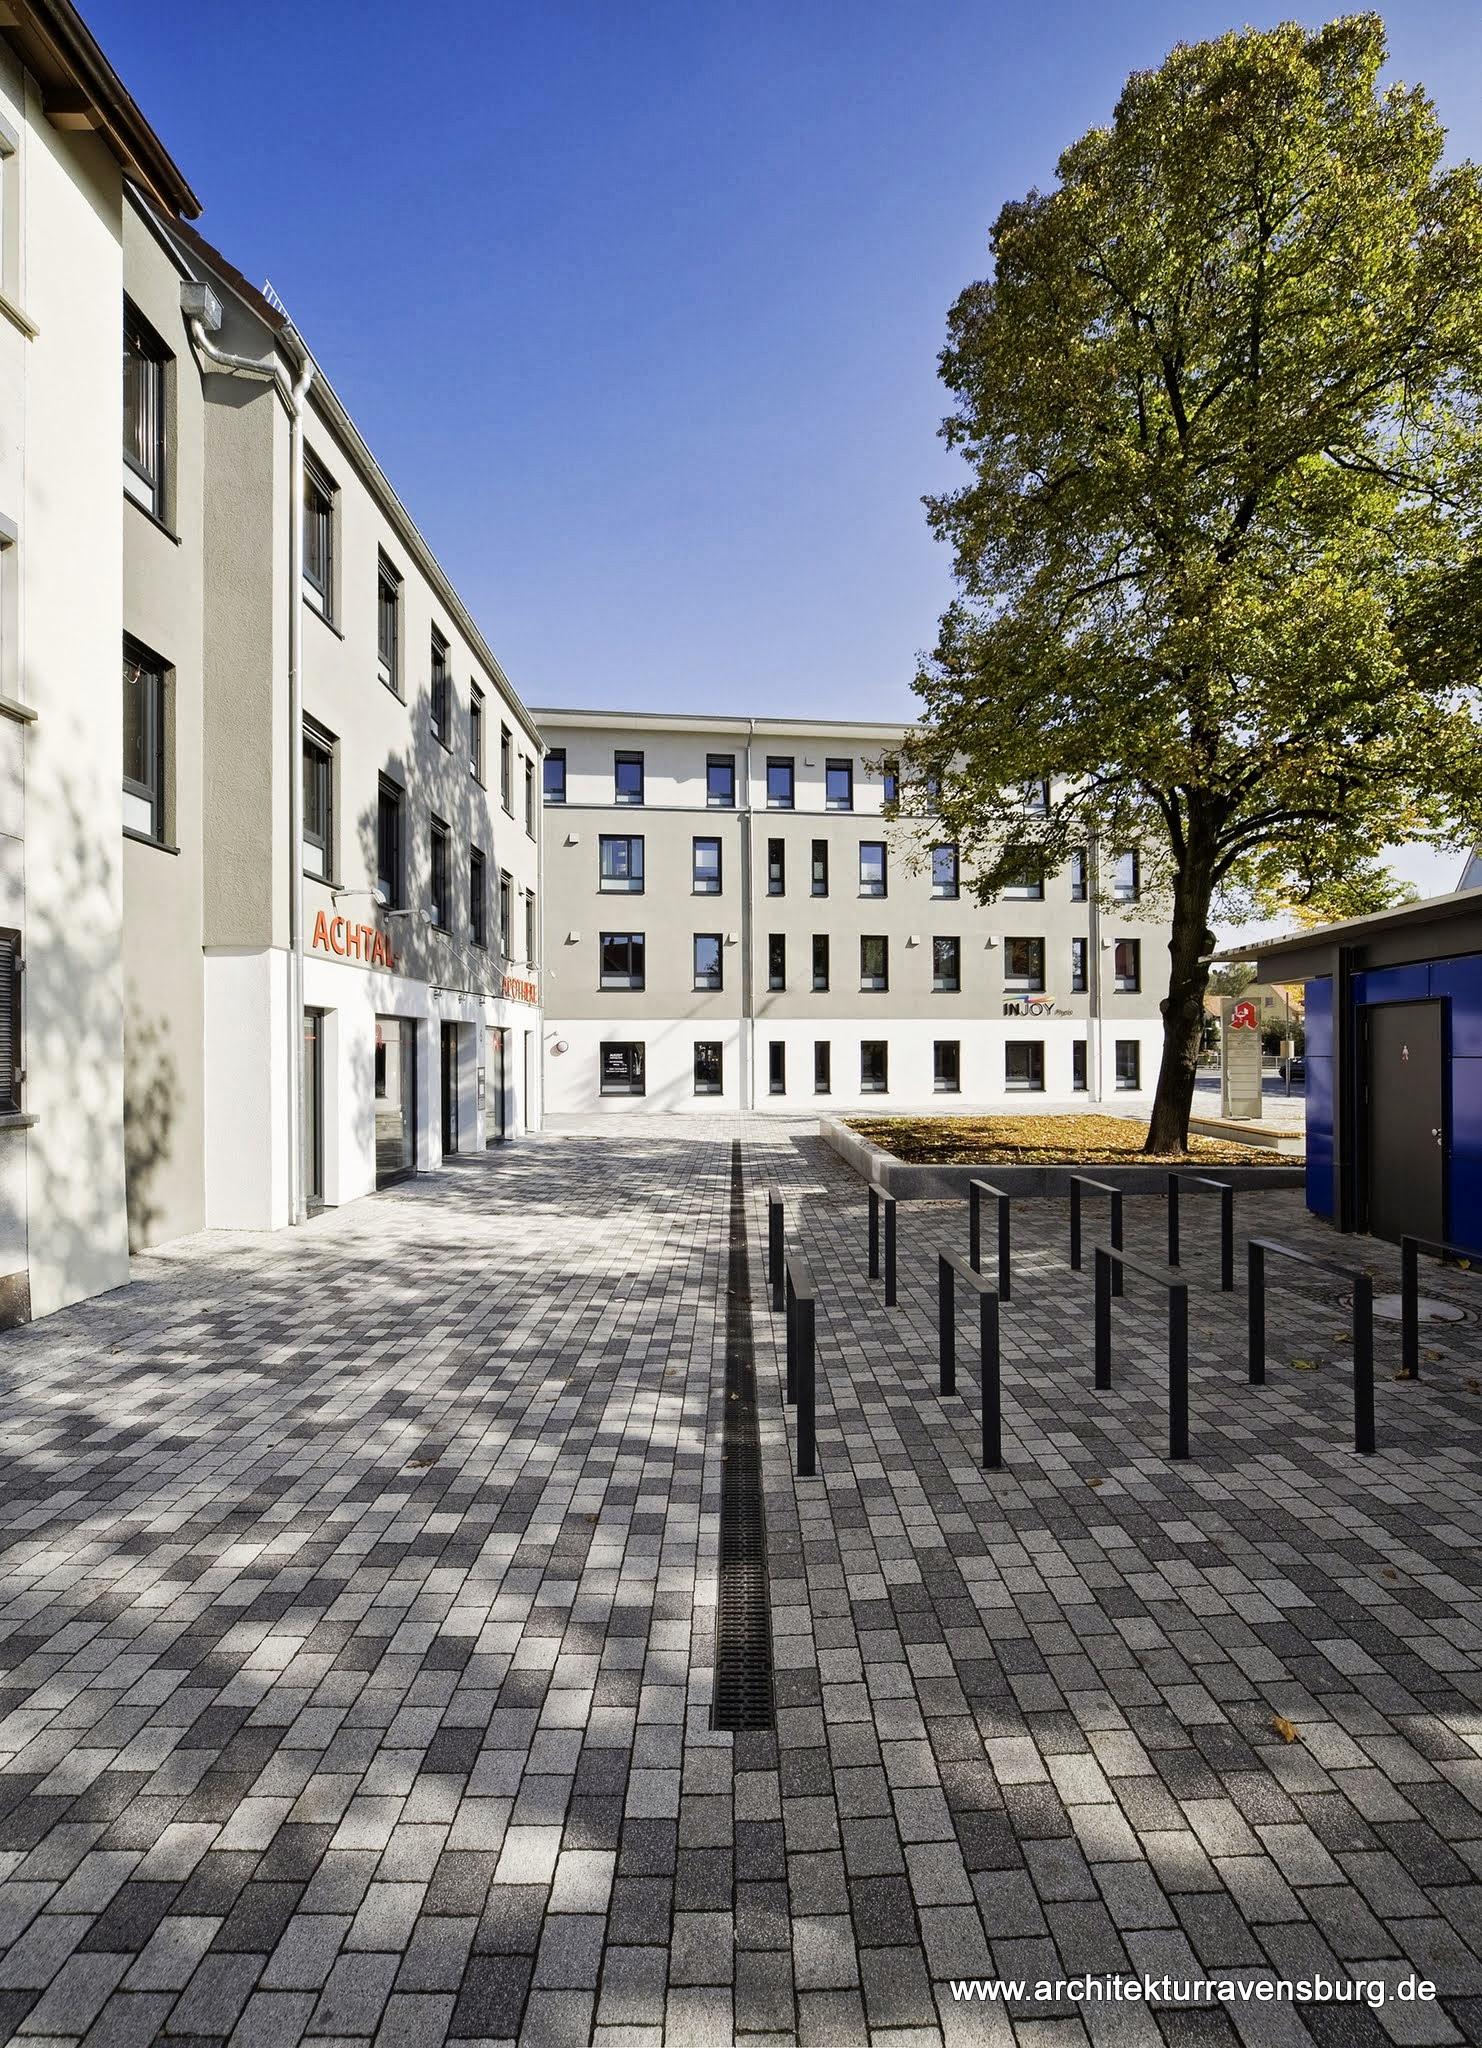 Architekten Ravensburg album